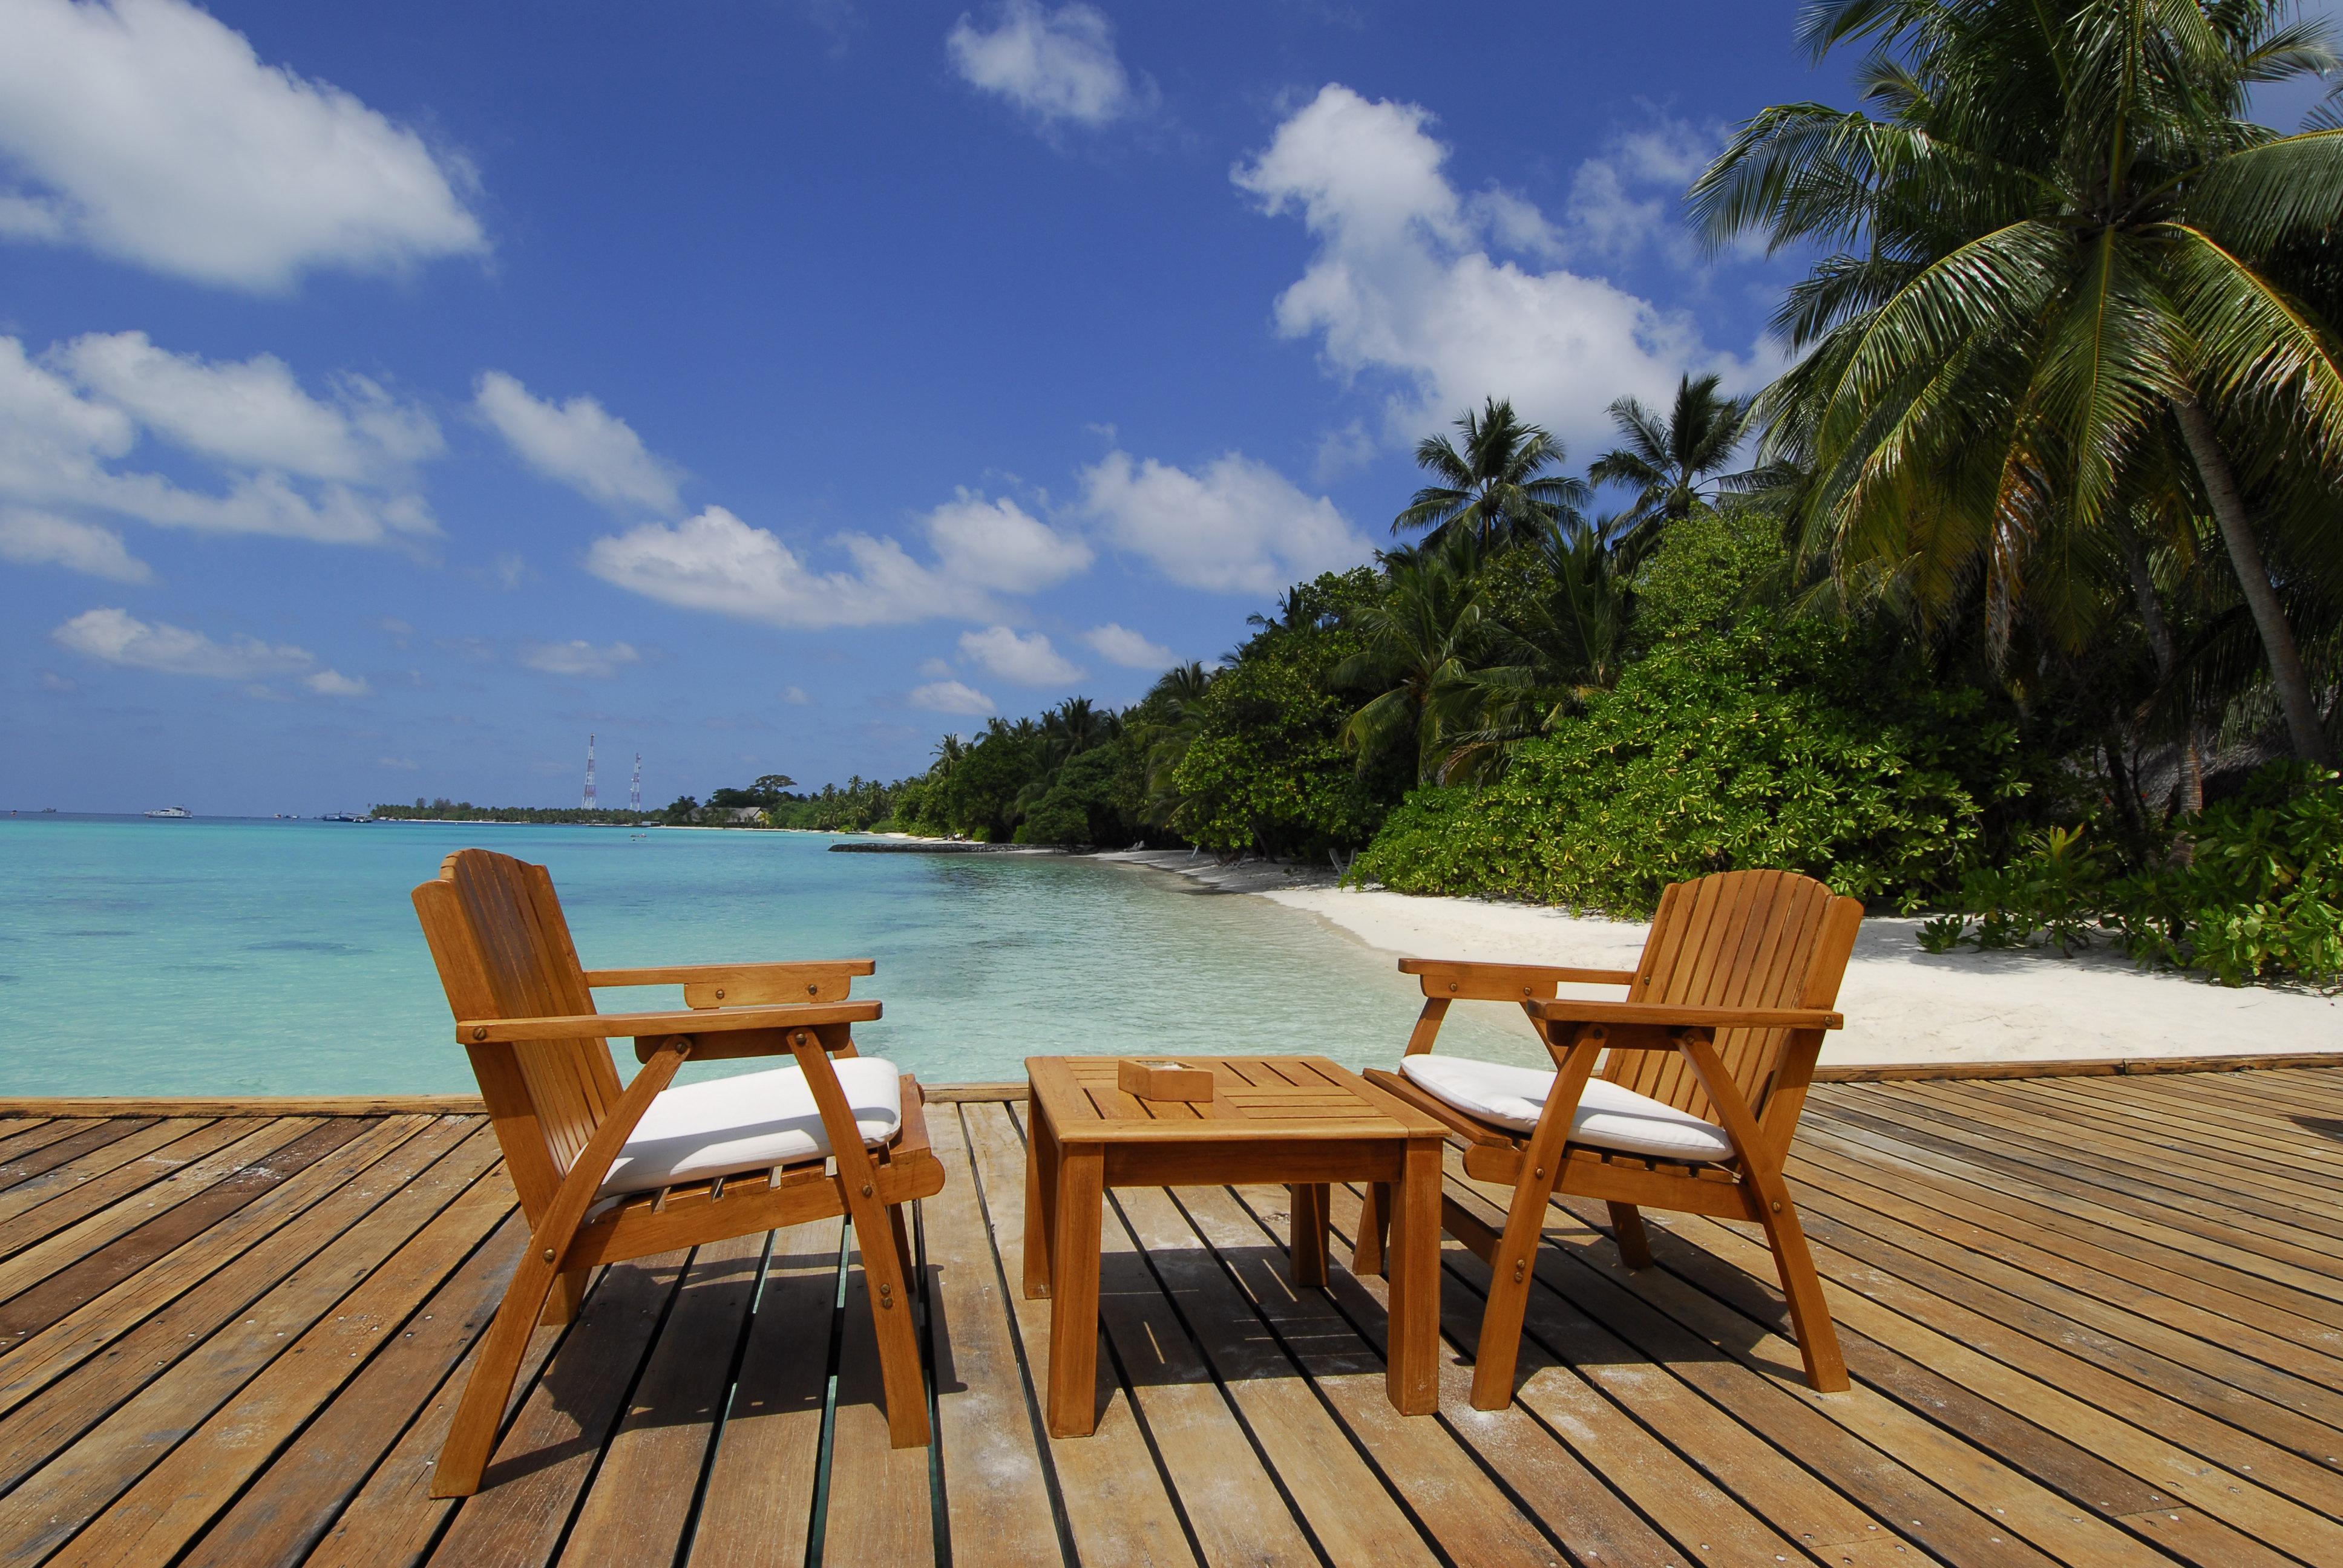 /optitravel/online/www/layout22/single_product.php?pkt_id=558&Produto=Dubai & Maldivas&destino=MALDIVAS